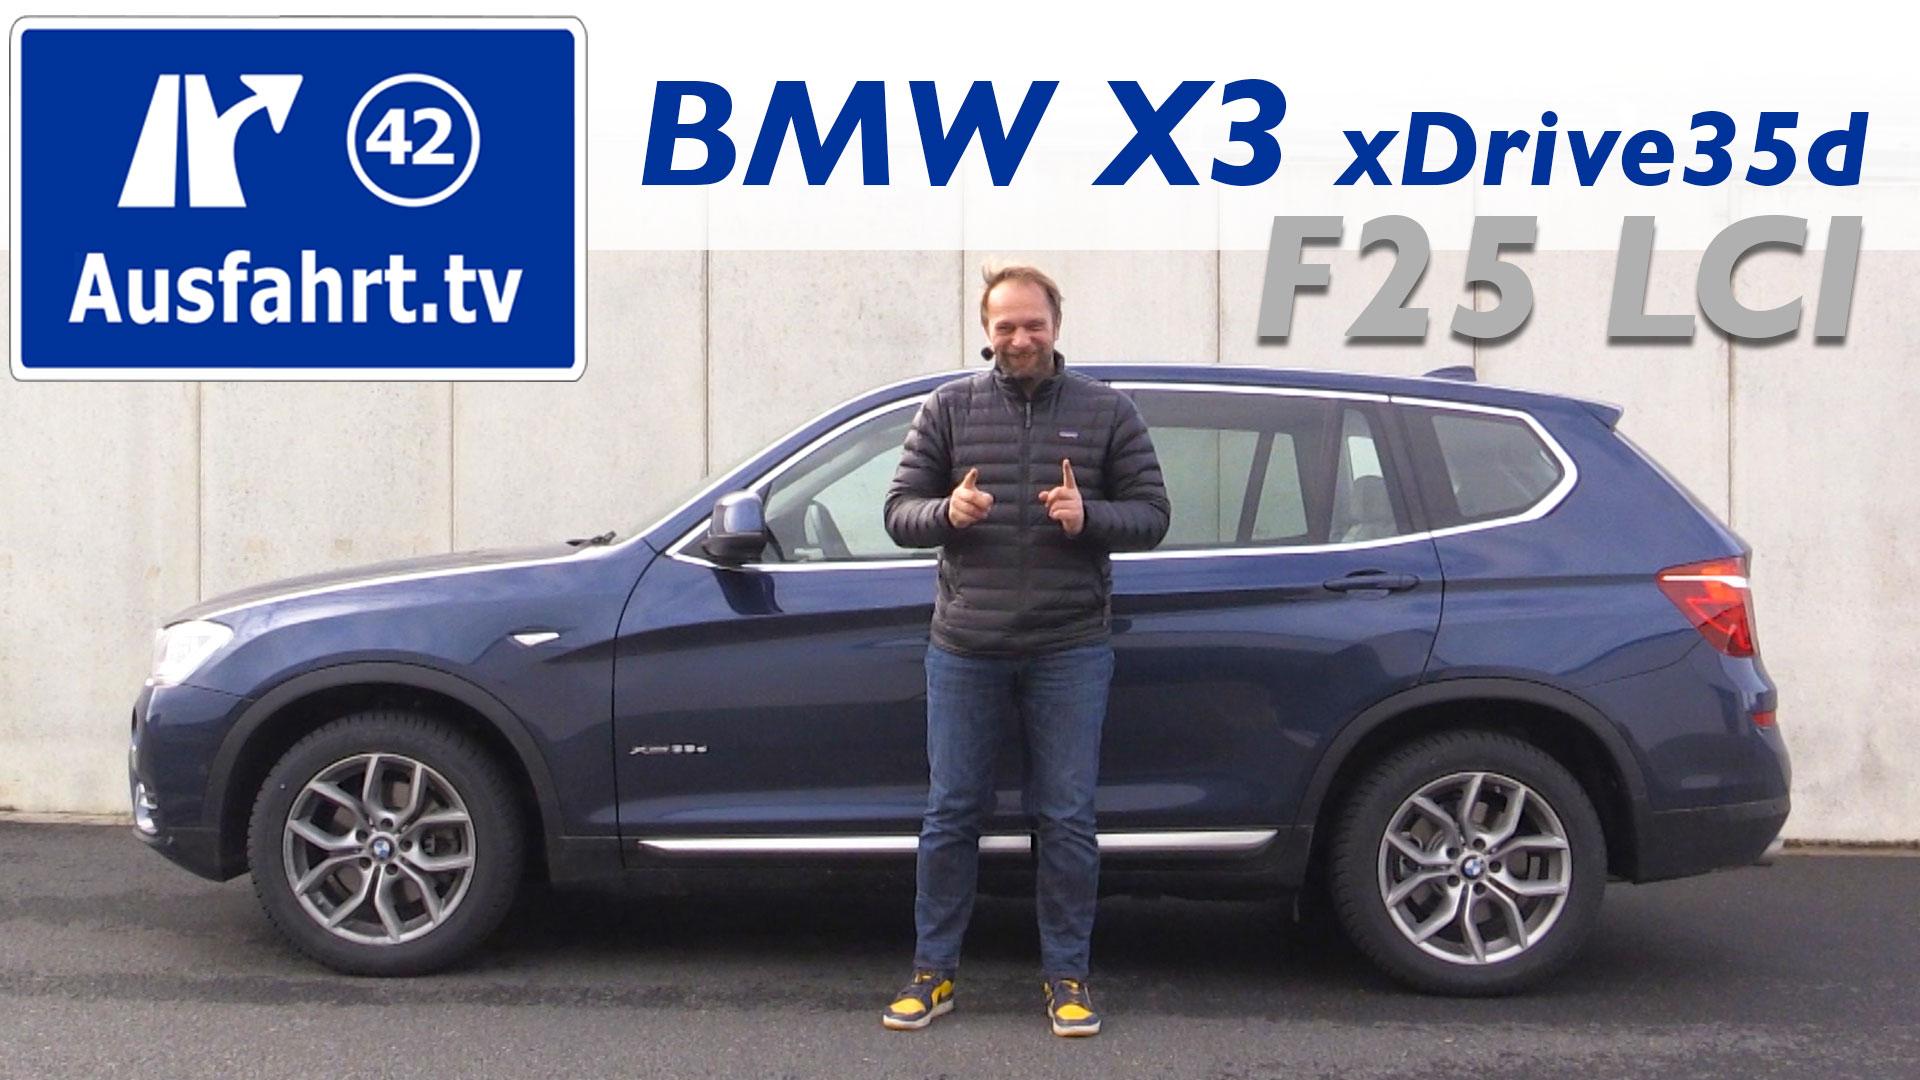 2016 BMW X3 xDrive35d F25 LCI